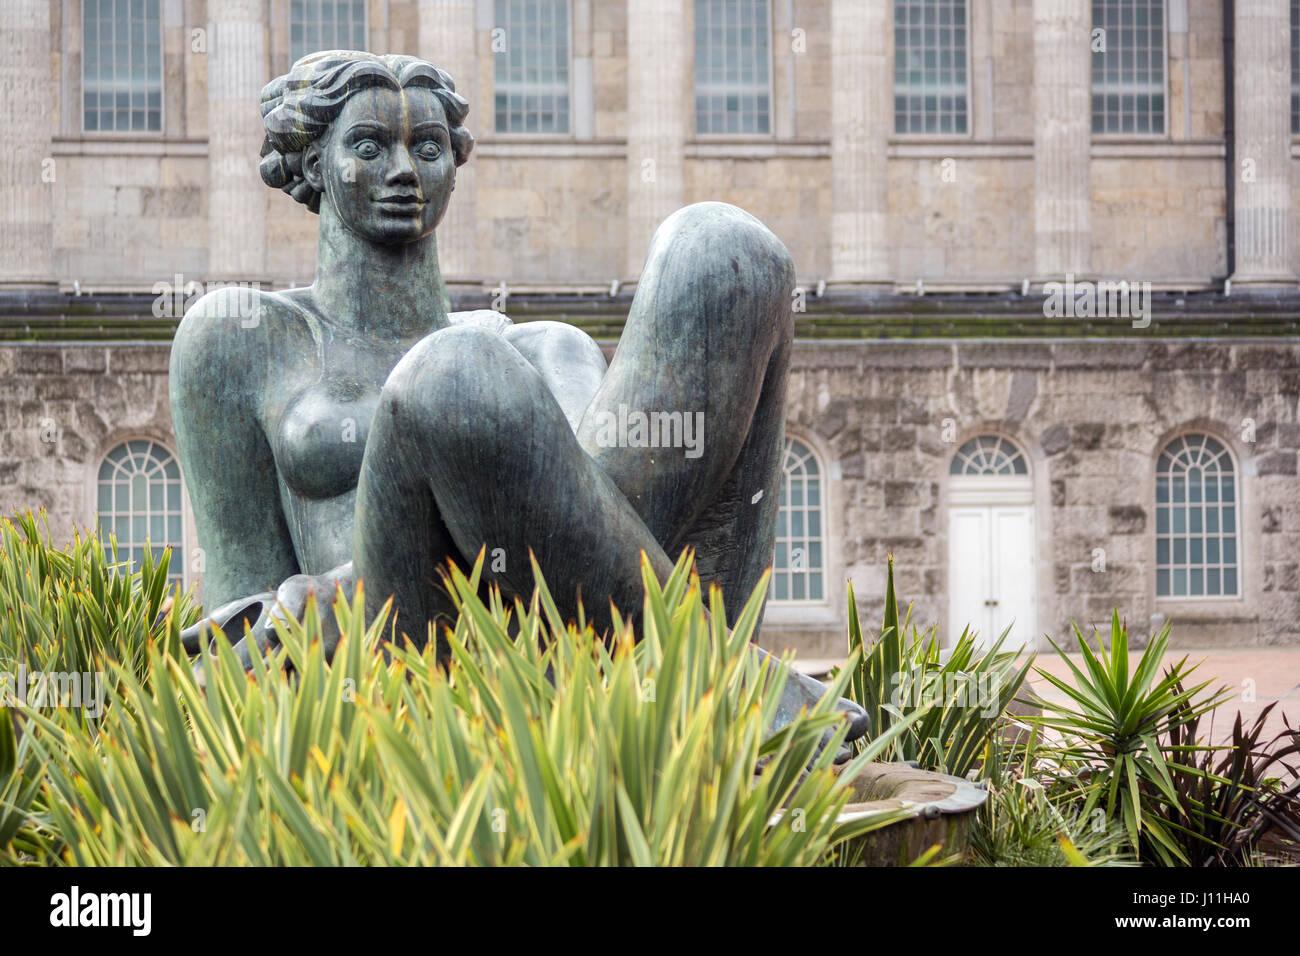 Floozie in the Jacuzzi statue, Victoria Square, Birmingham, UK - Stock Image